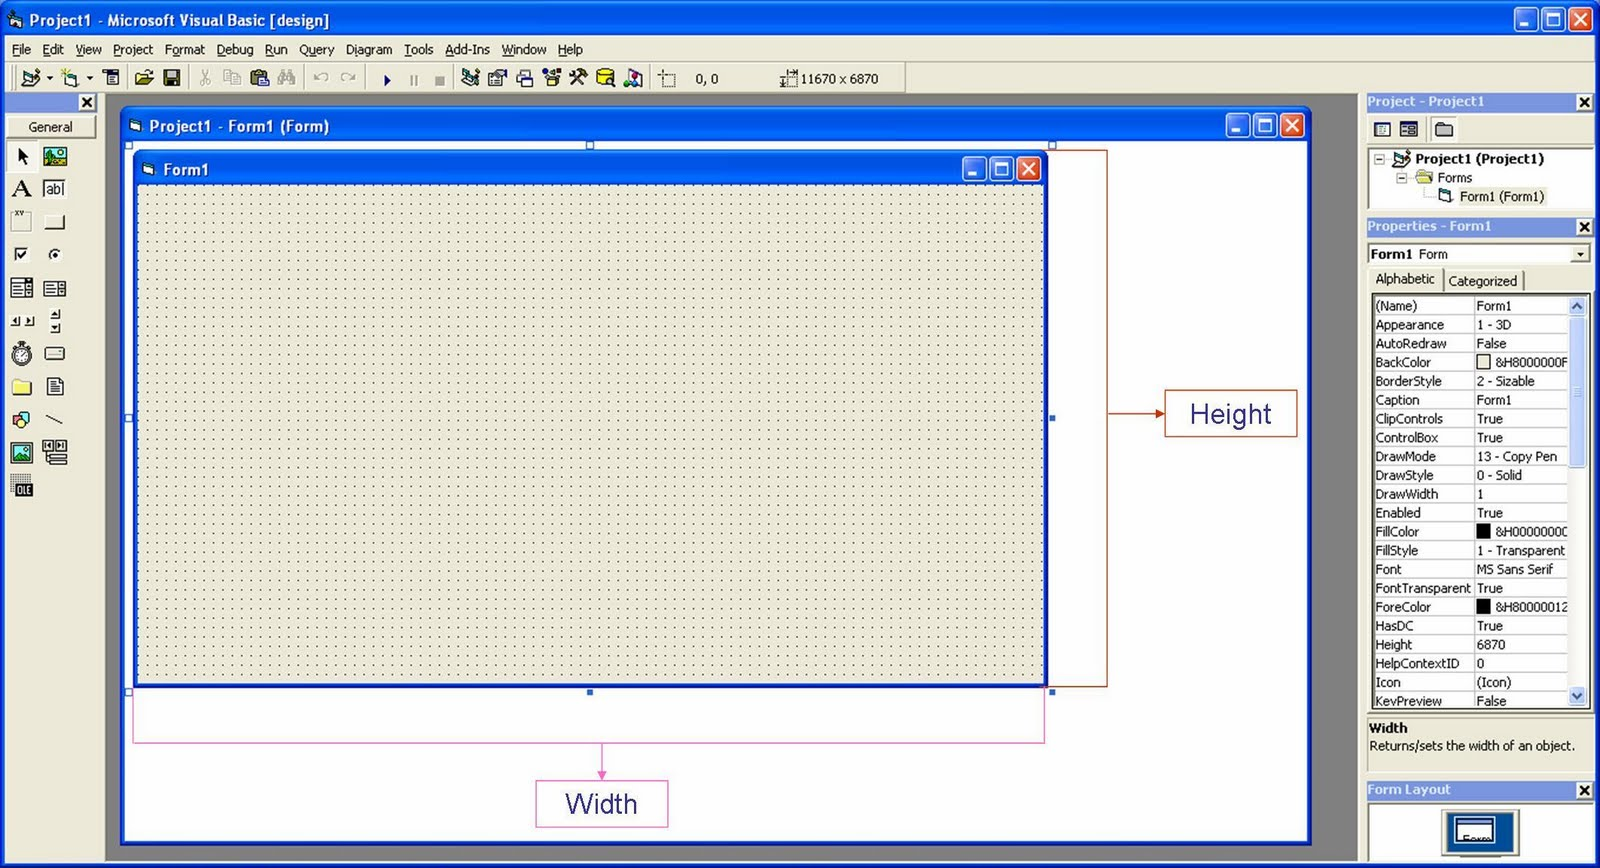 visual basic 6 0 Microsoft visual basic 6 0 free download - learn visual basic 6, microsoft visual basic, microsoft visual basic 6 common controls, and many more programs.